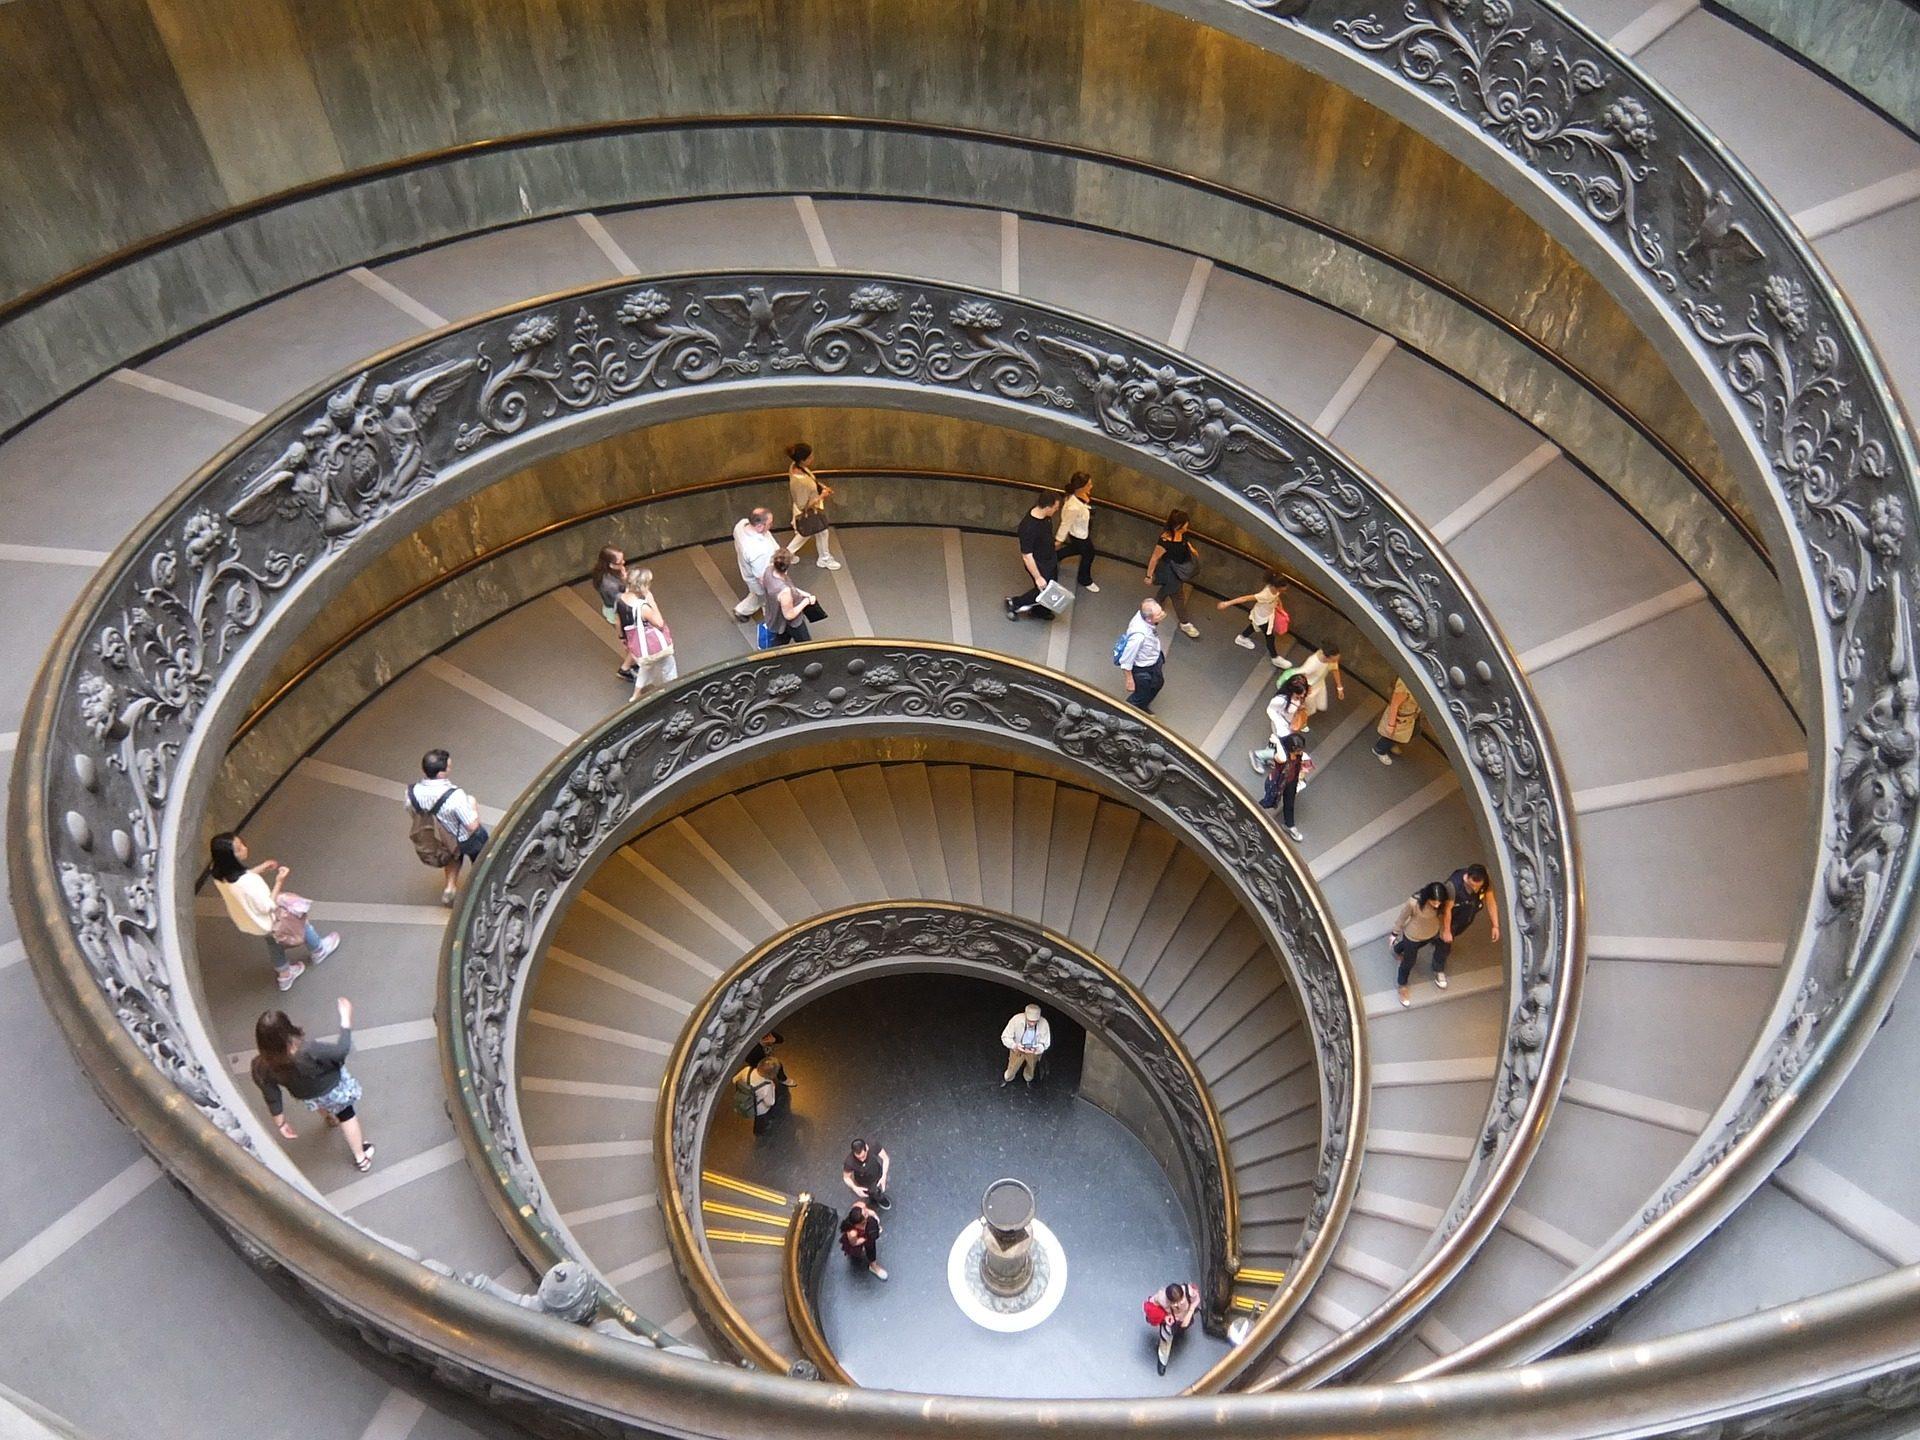 Treppen, kreisförmige, Schnecke, Touristen, Ornamentik, Rom - Wallpaper HD - Prof.-falken.com